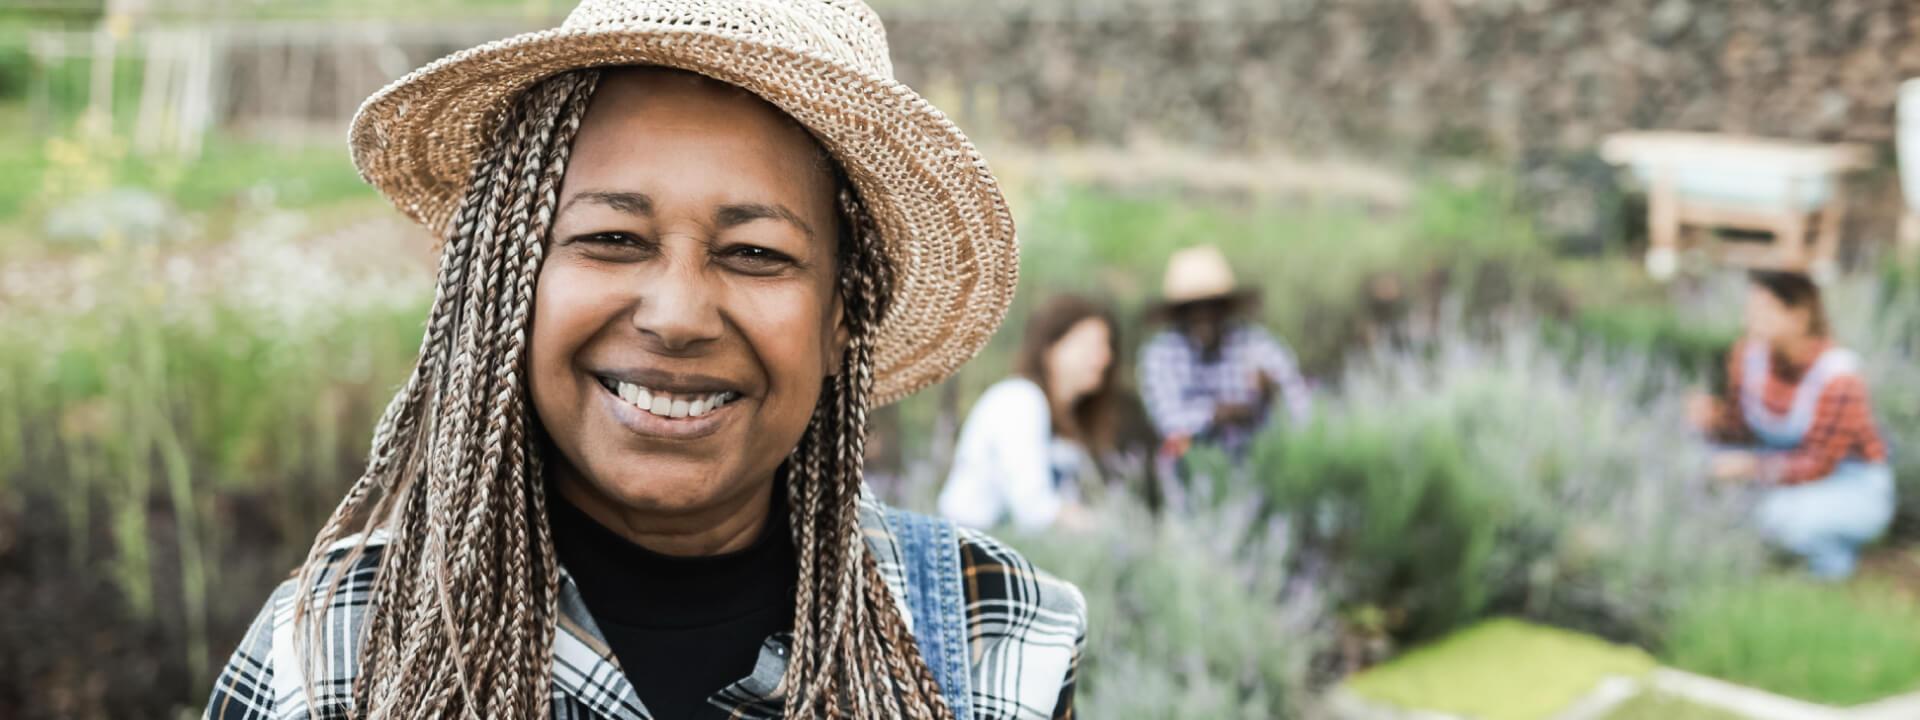 african-senior-farmer-smiling-on-camera-during-har-UEQ6Q3E (2) (1)